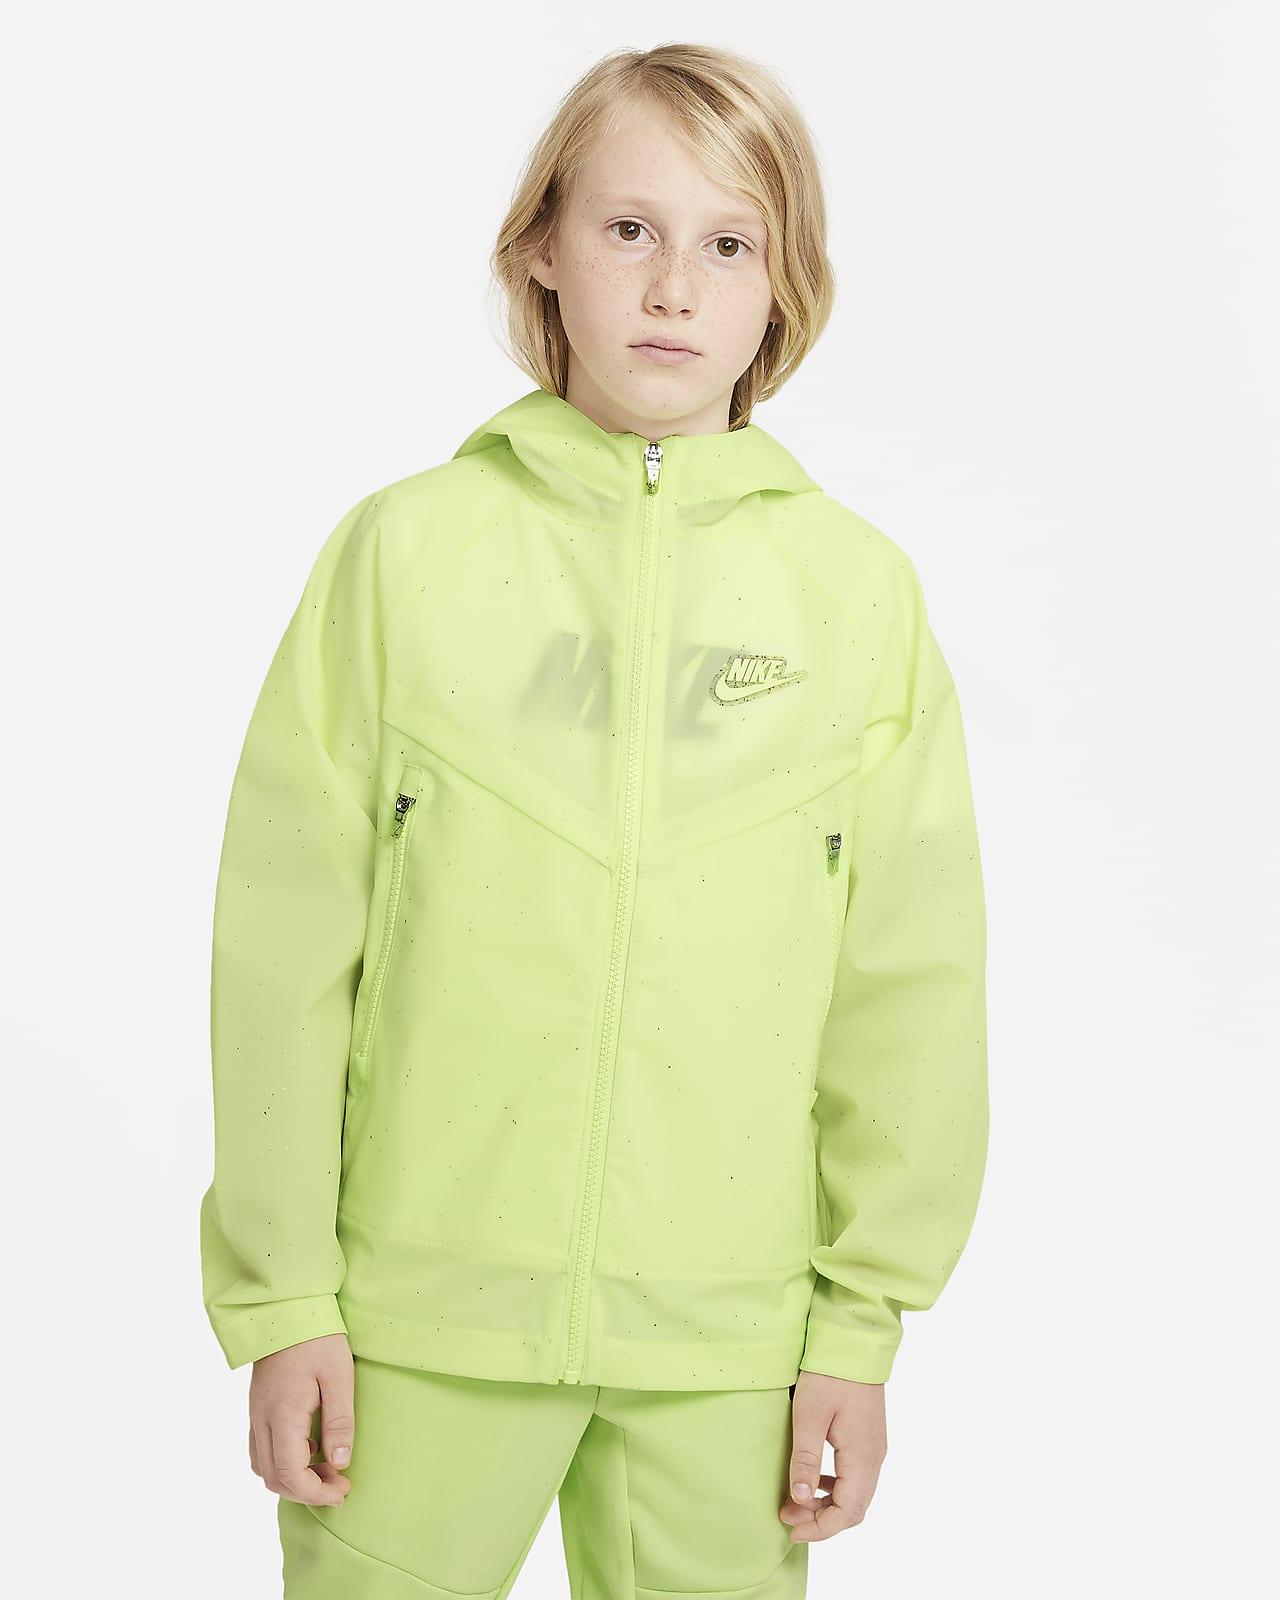 Куртка с капюшоном для школьников Nike Sportswear Windrunner Zero